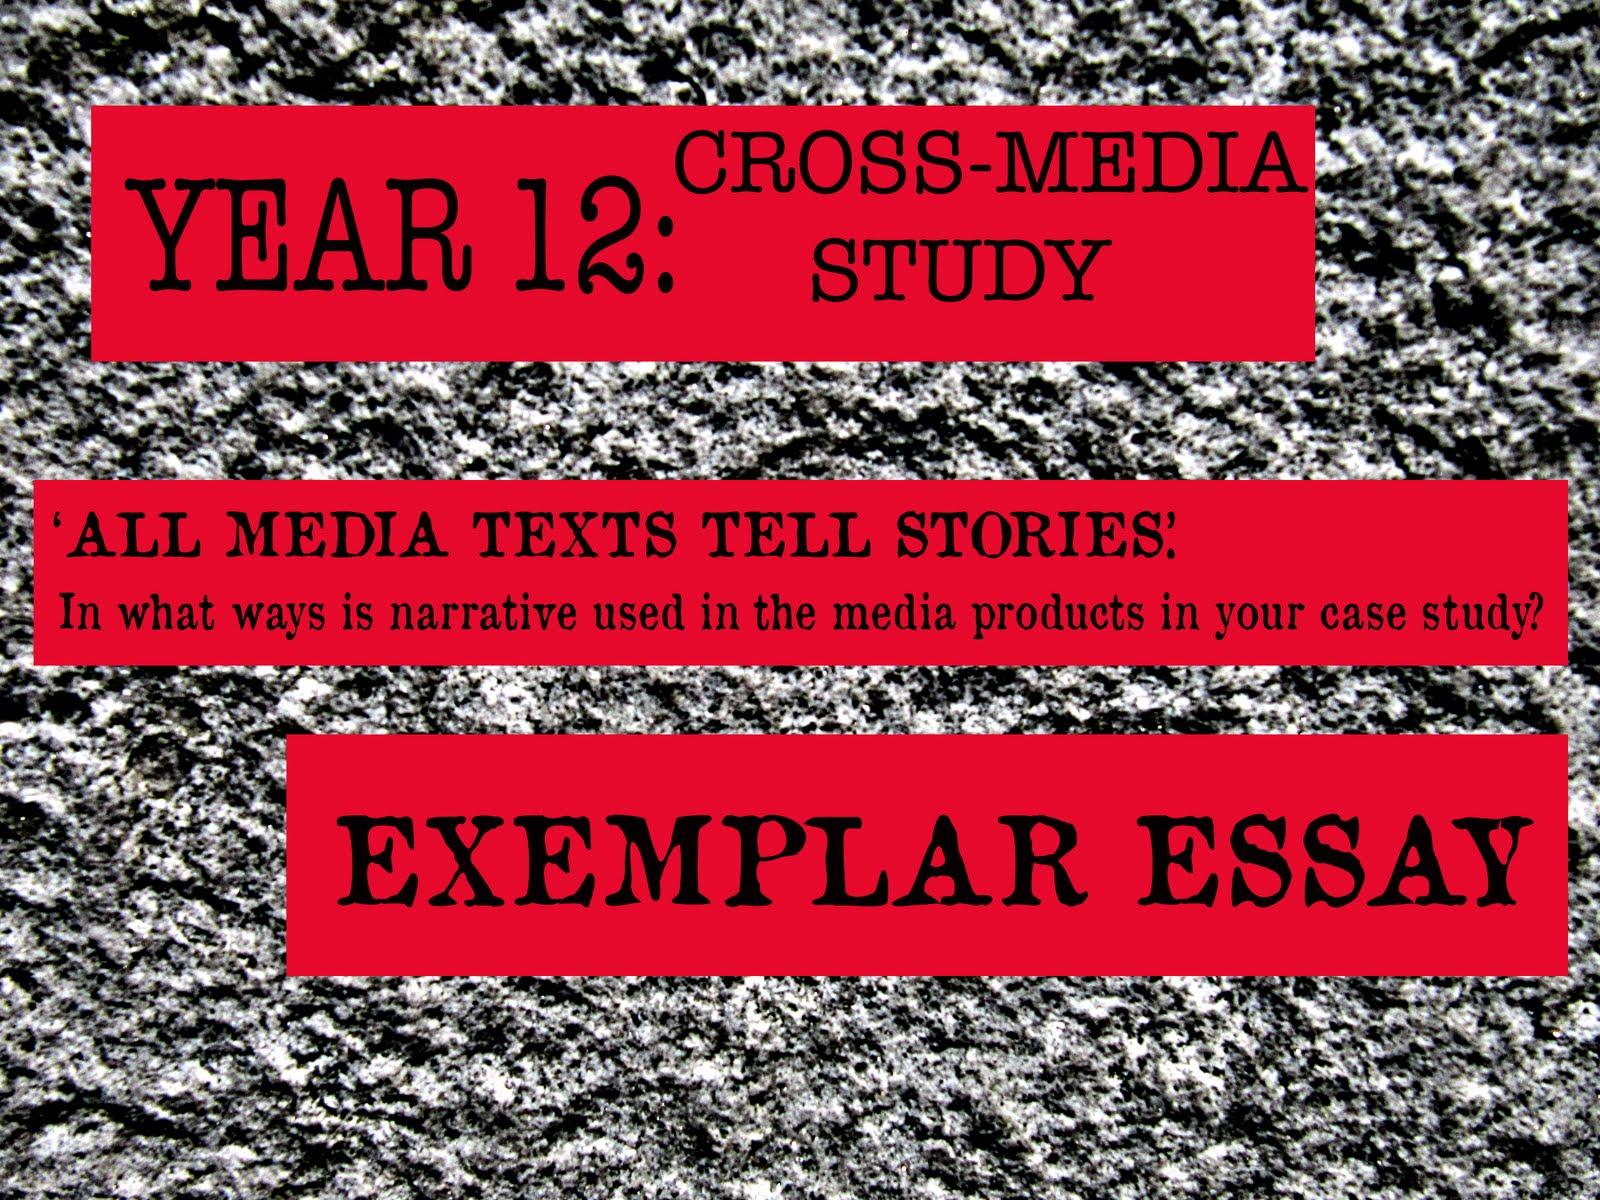 fishymedia resources for a as media studies year cross  year 12 cross media study exemplar essay